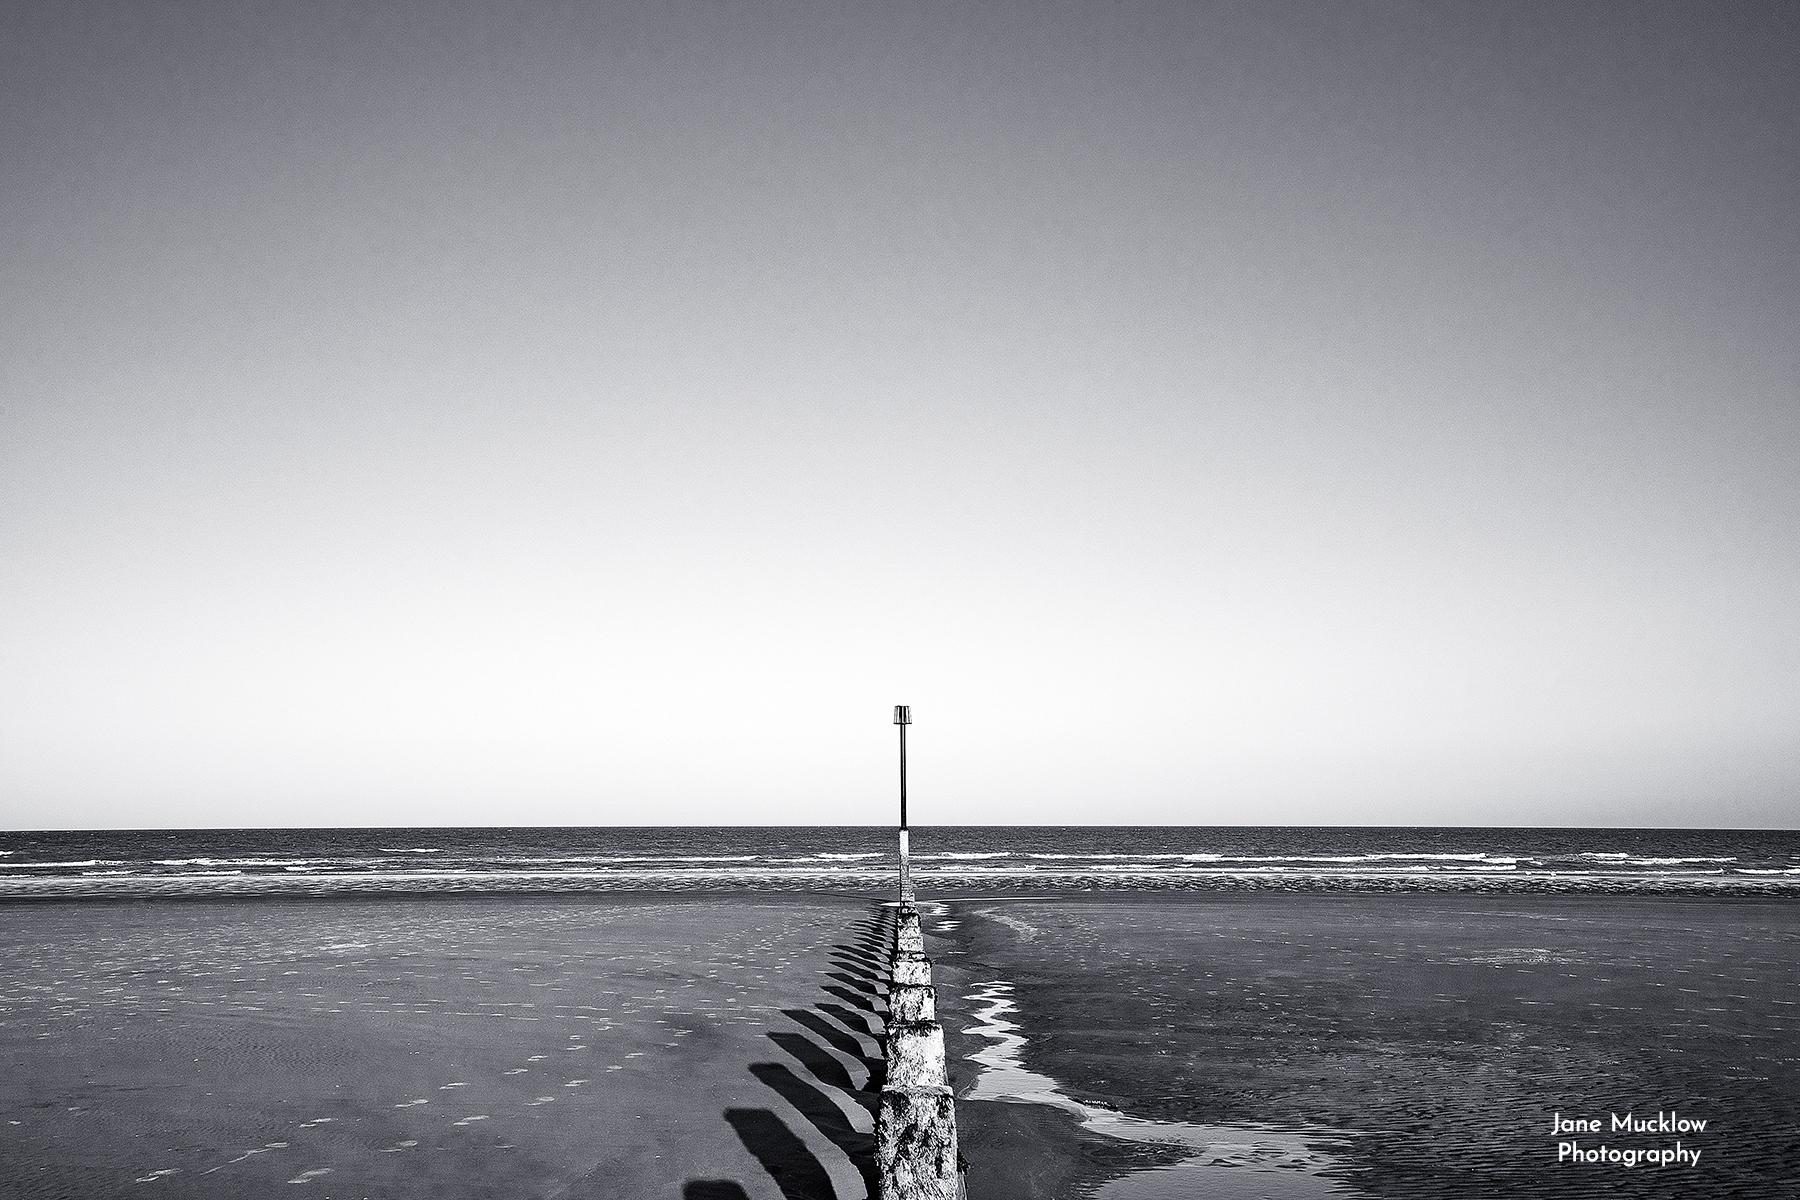 Photo of beach groyne at Dymchurch Kent by Jane Mucklow